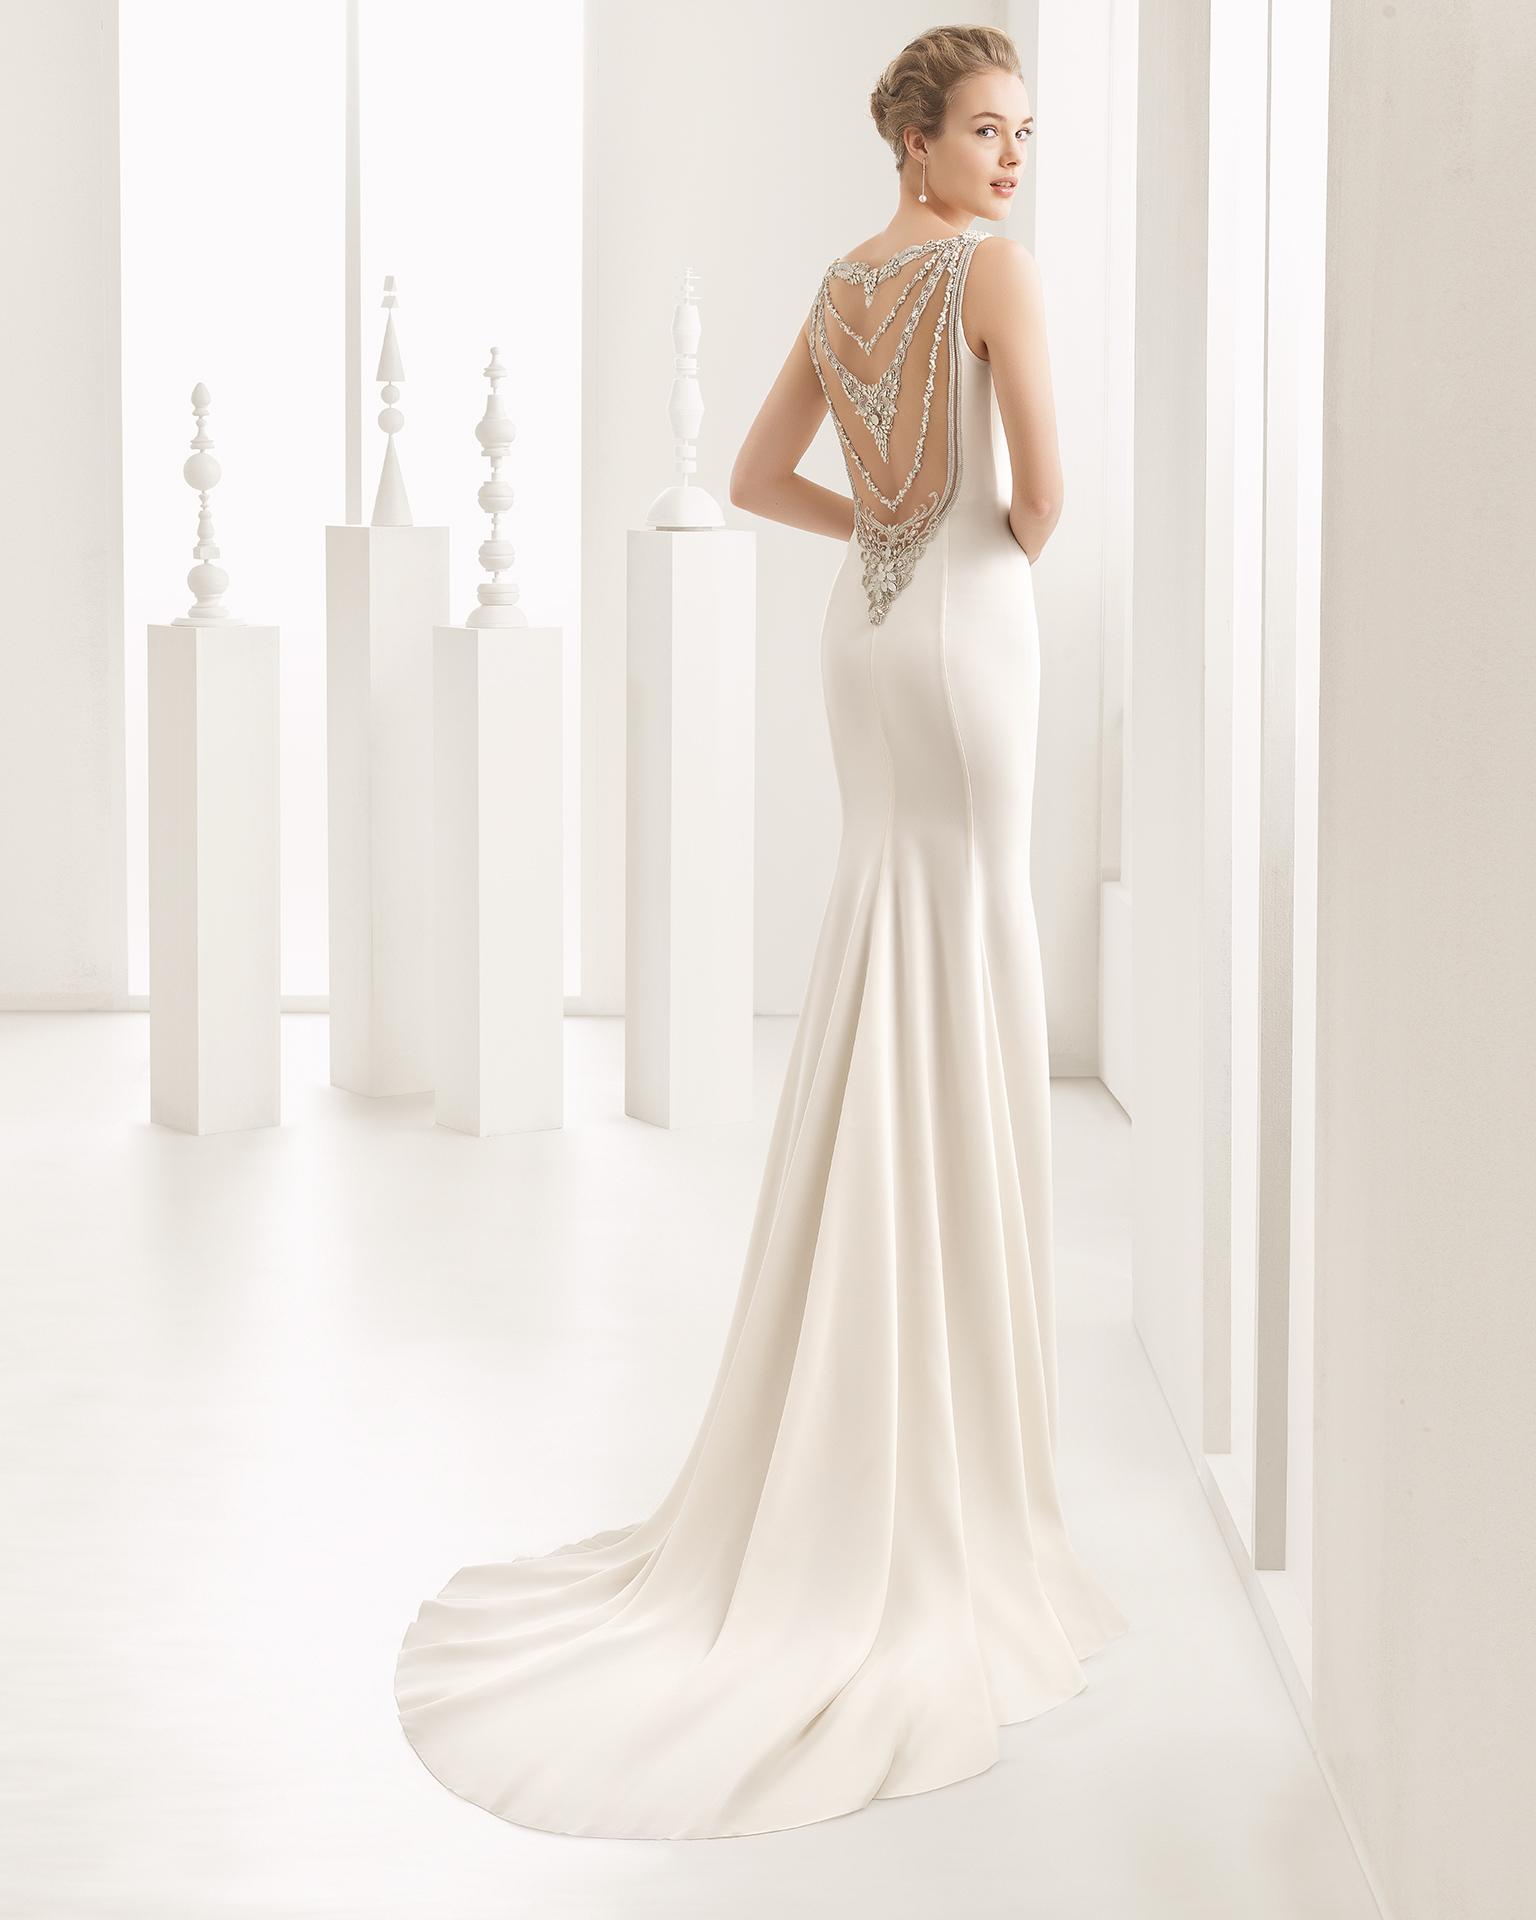 65 Perfect Low Back Wedding Dresses The Best Wedding Dresses